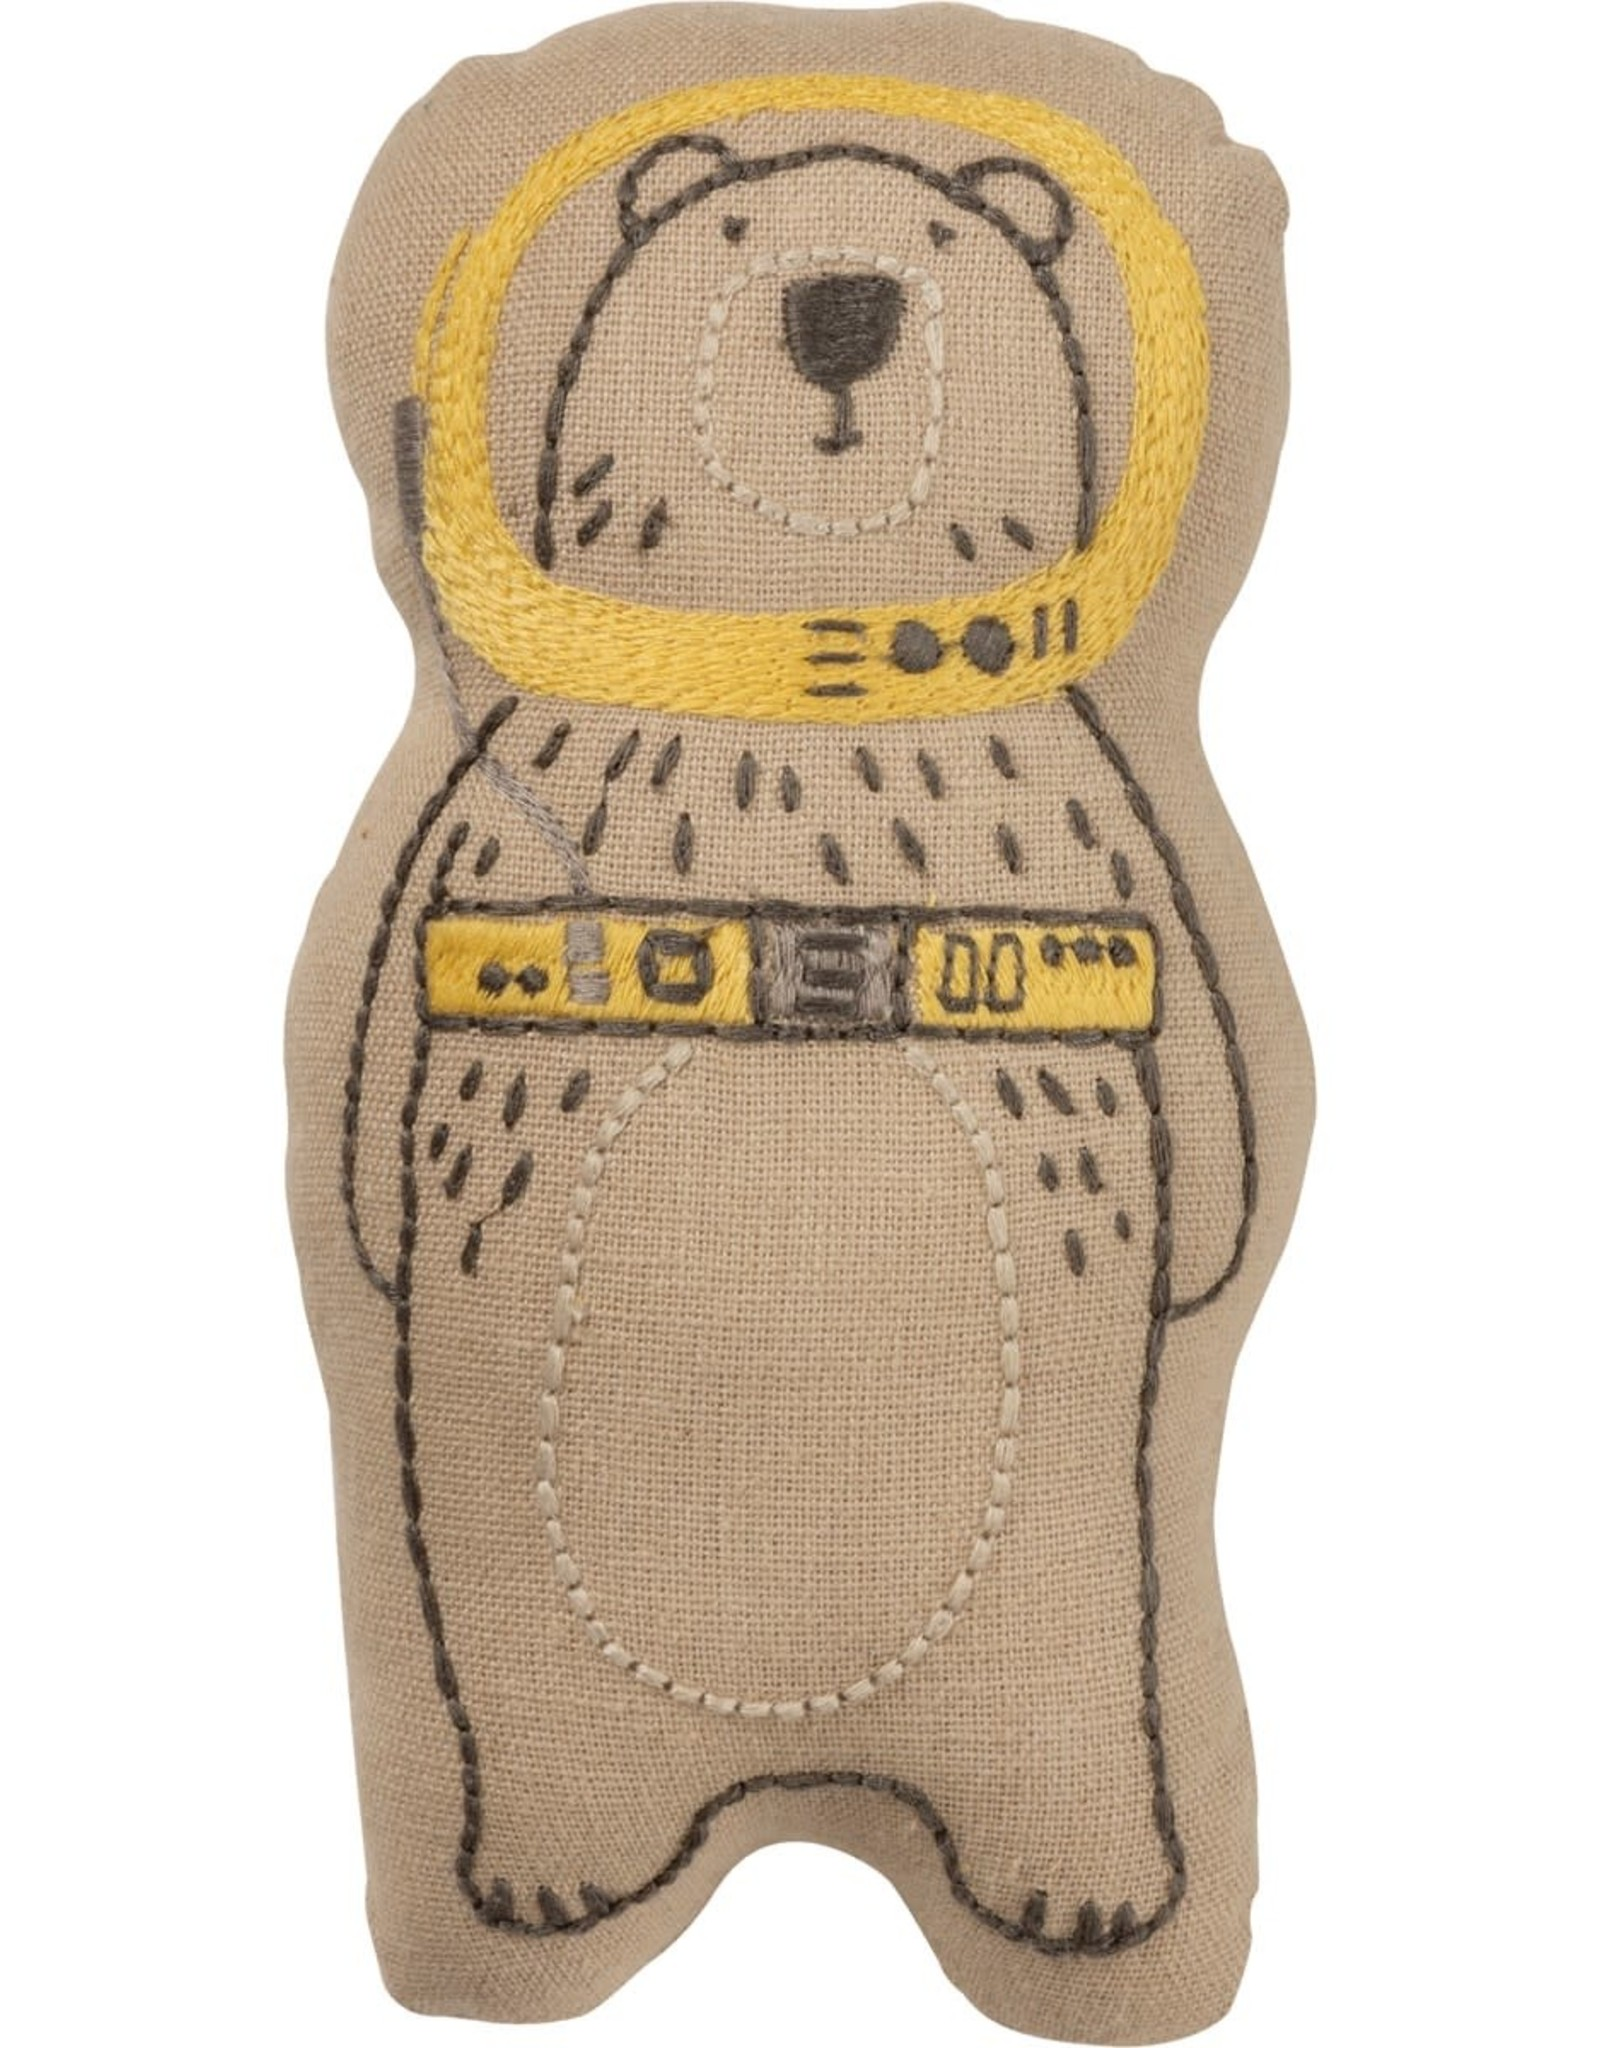 Softie - Astronaut Bear